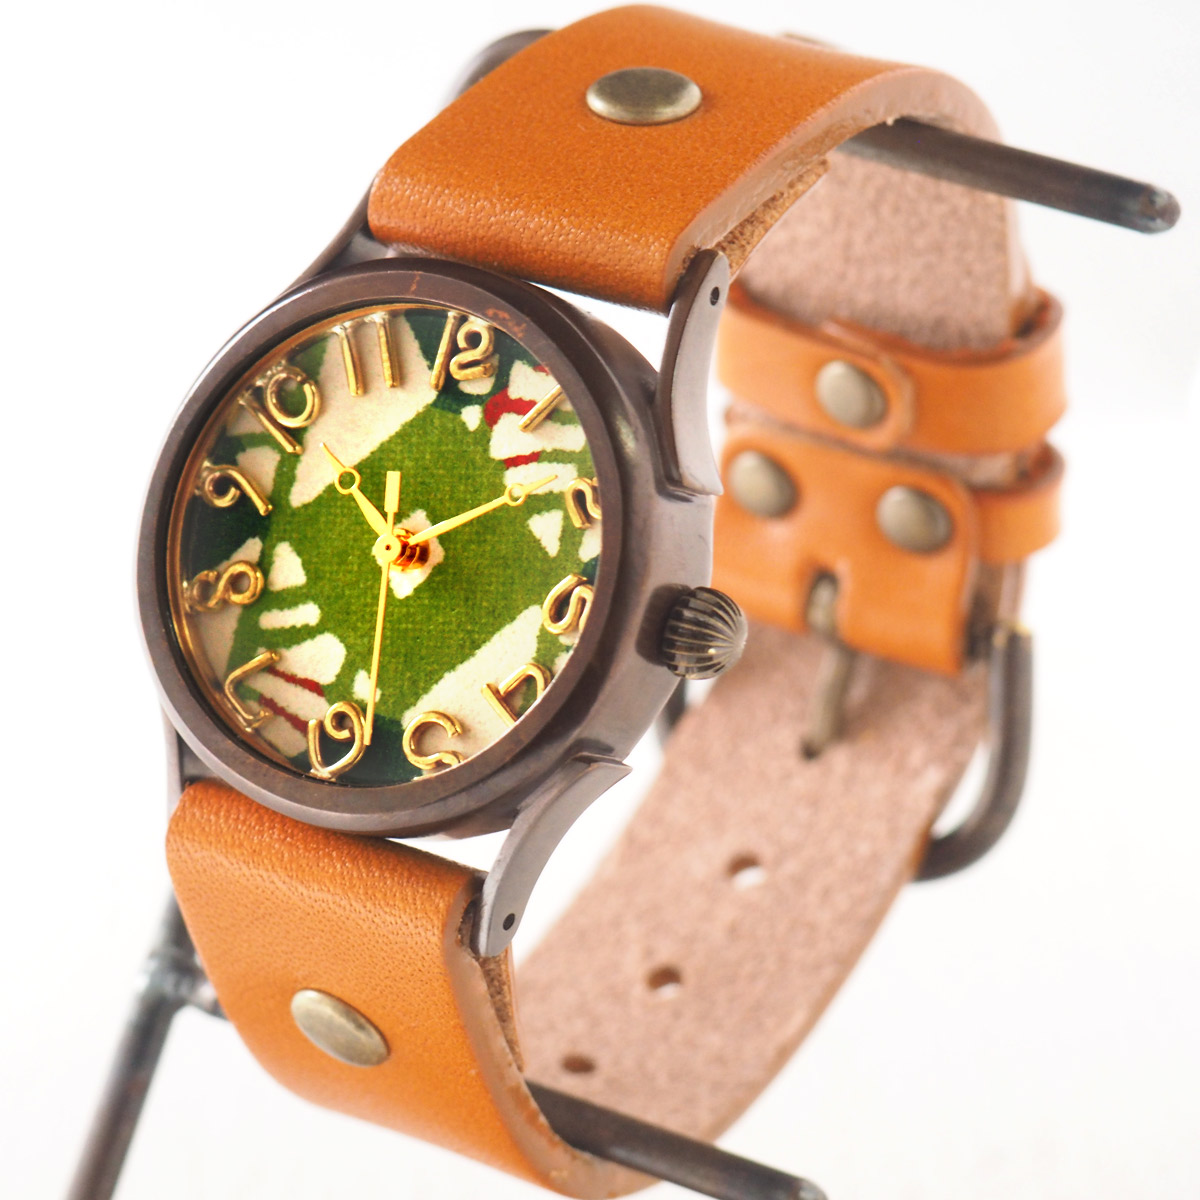 "vie(ヴィー) 手作り腕時計 ""和tch"" 和紙文字盤 和時計 菱緑 グリーン Mサイズ [MJ-004M-GR]"